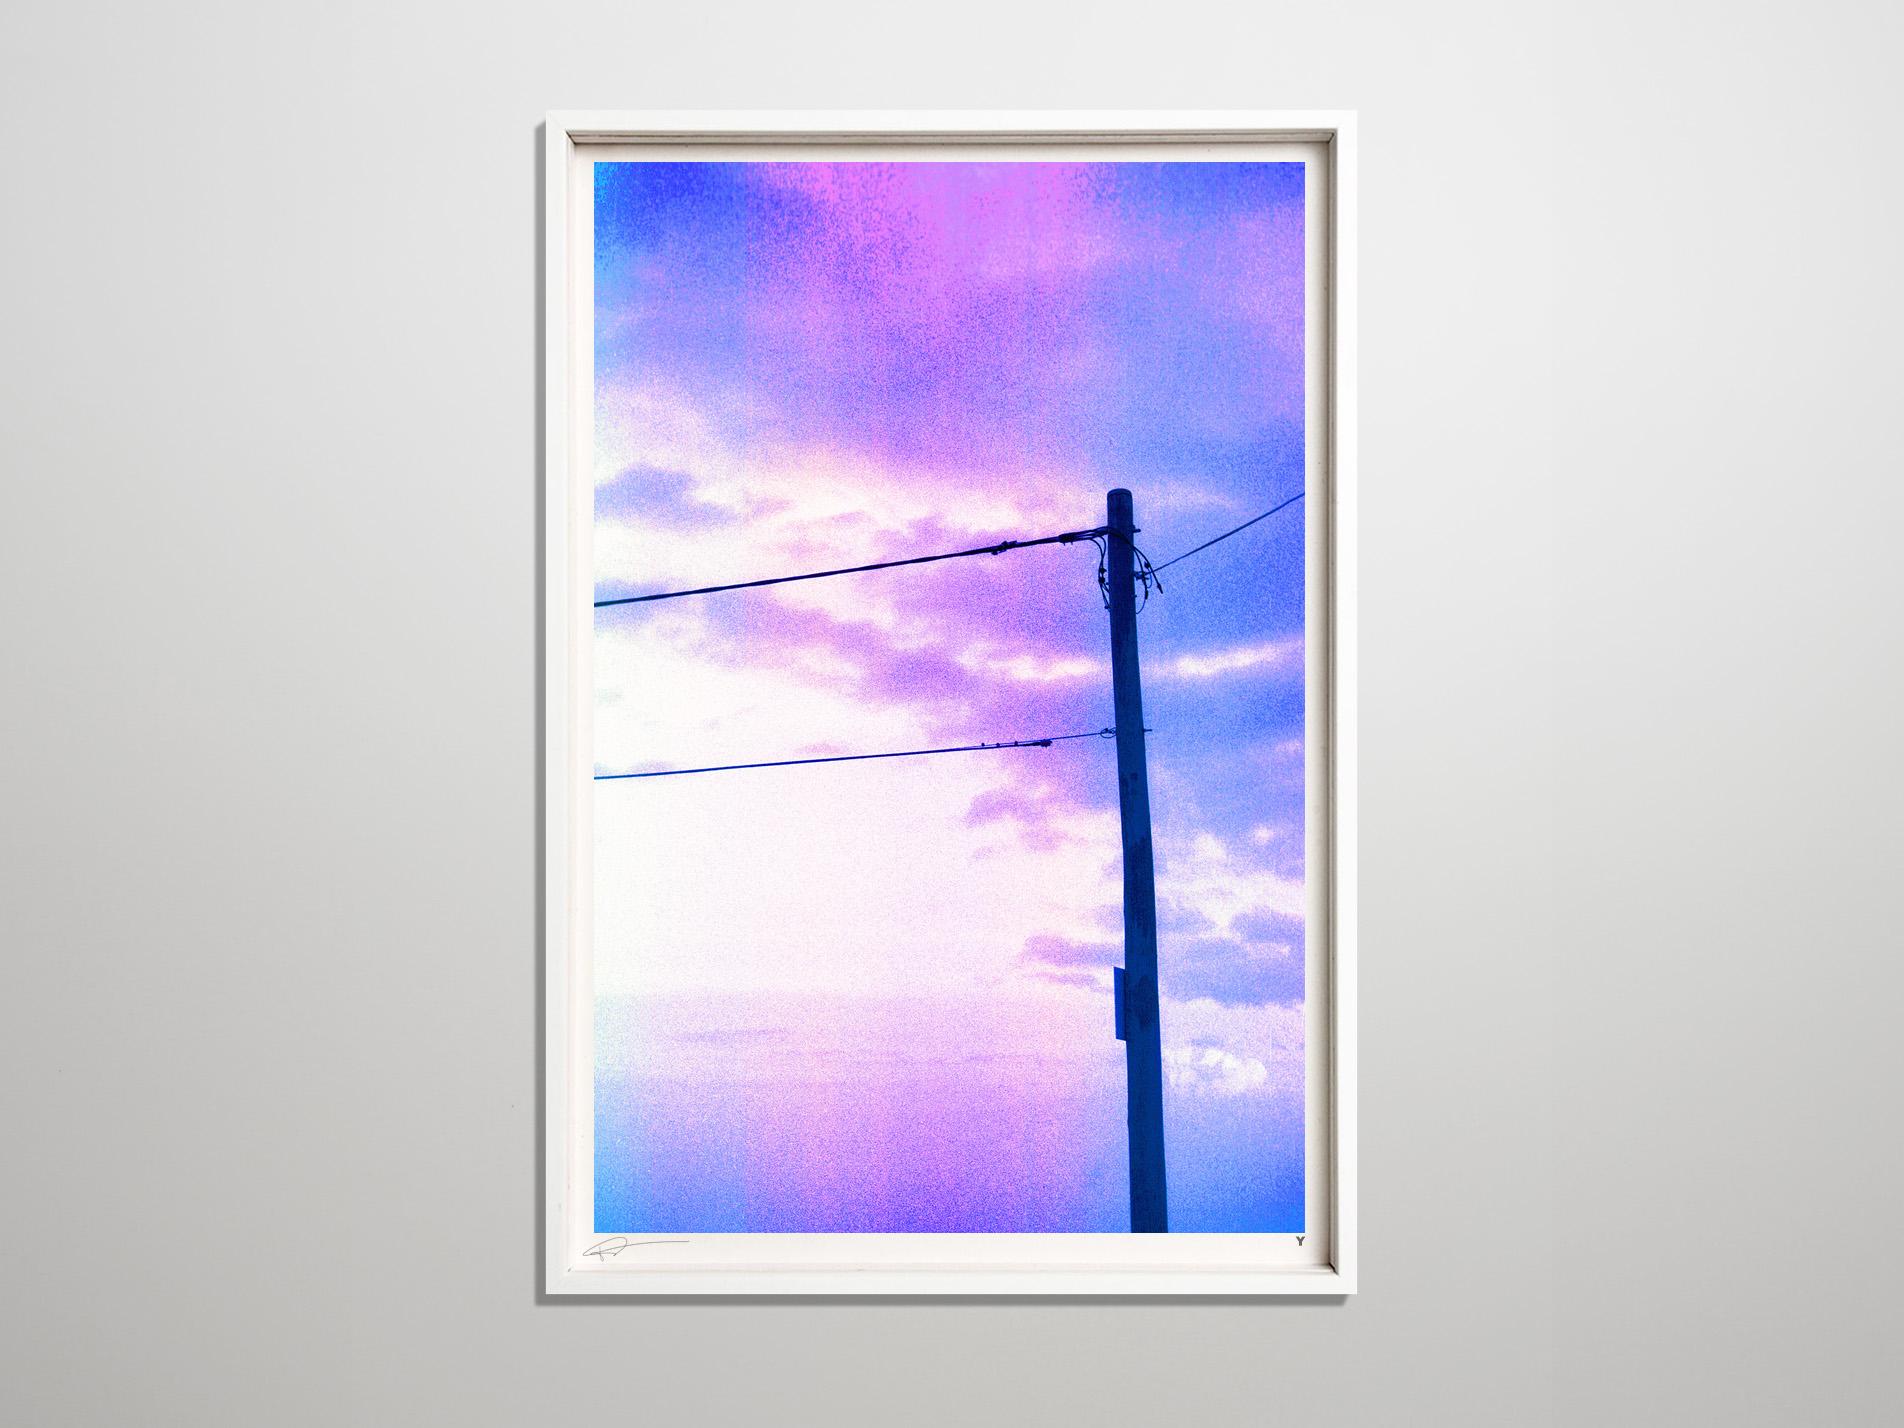 segments frame portrait 4.jpg